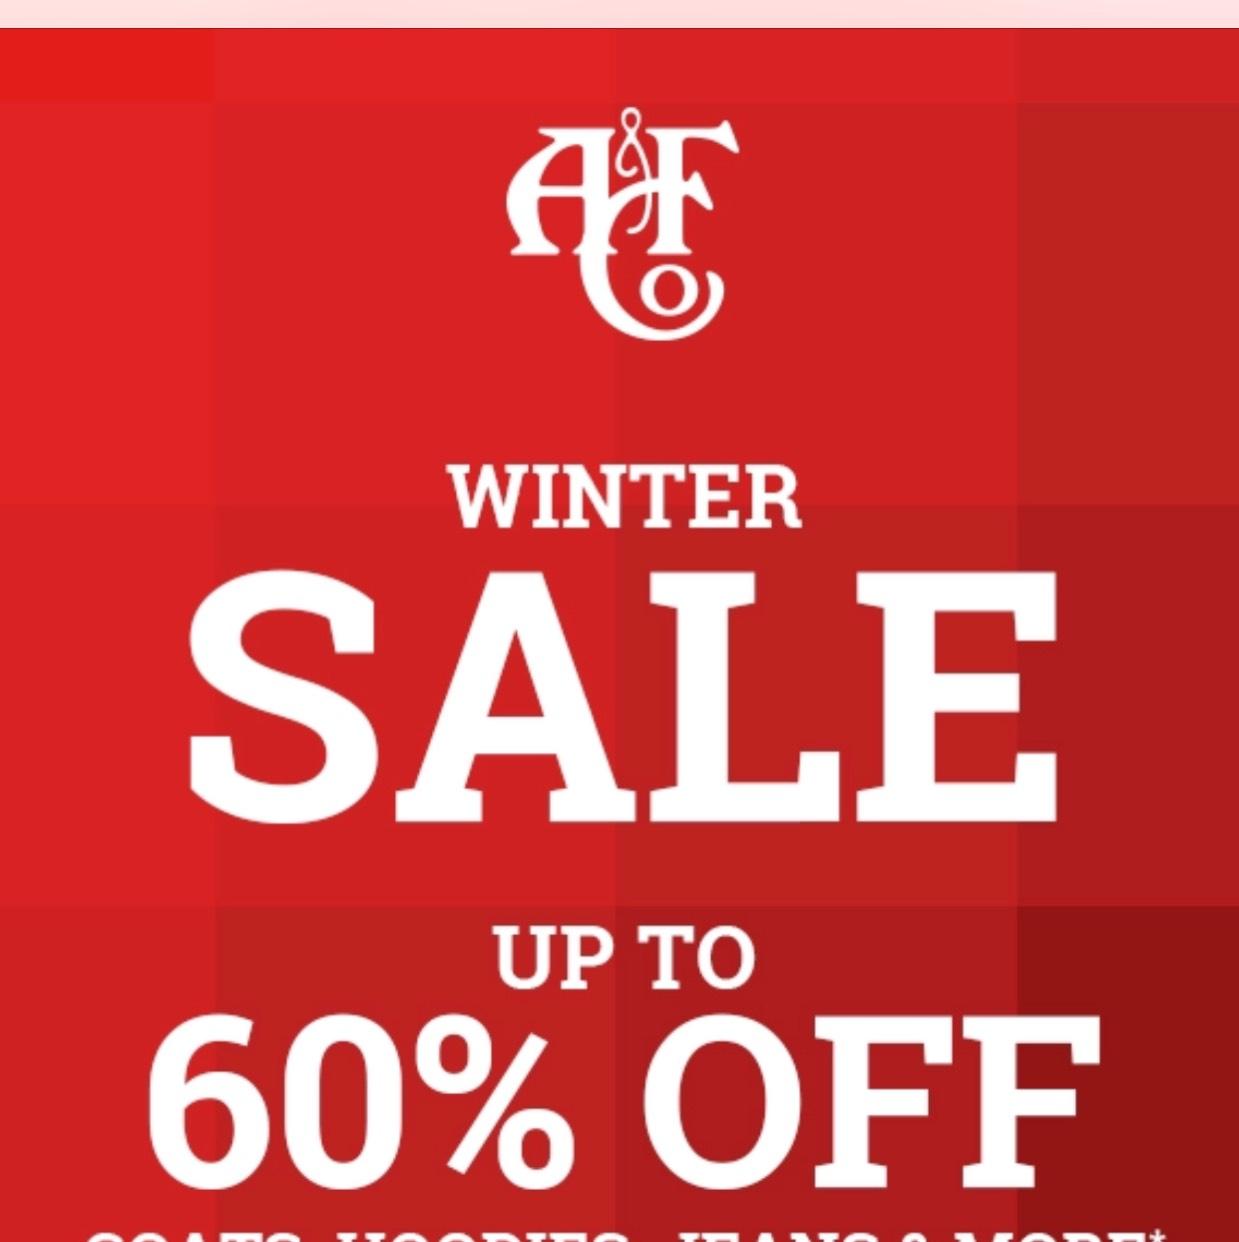 Bis zu 60% Sale bei Abercrombie&Fitch